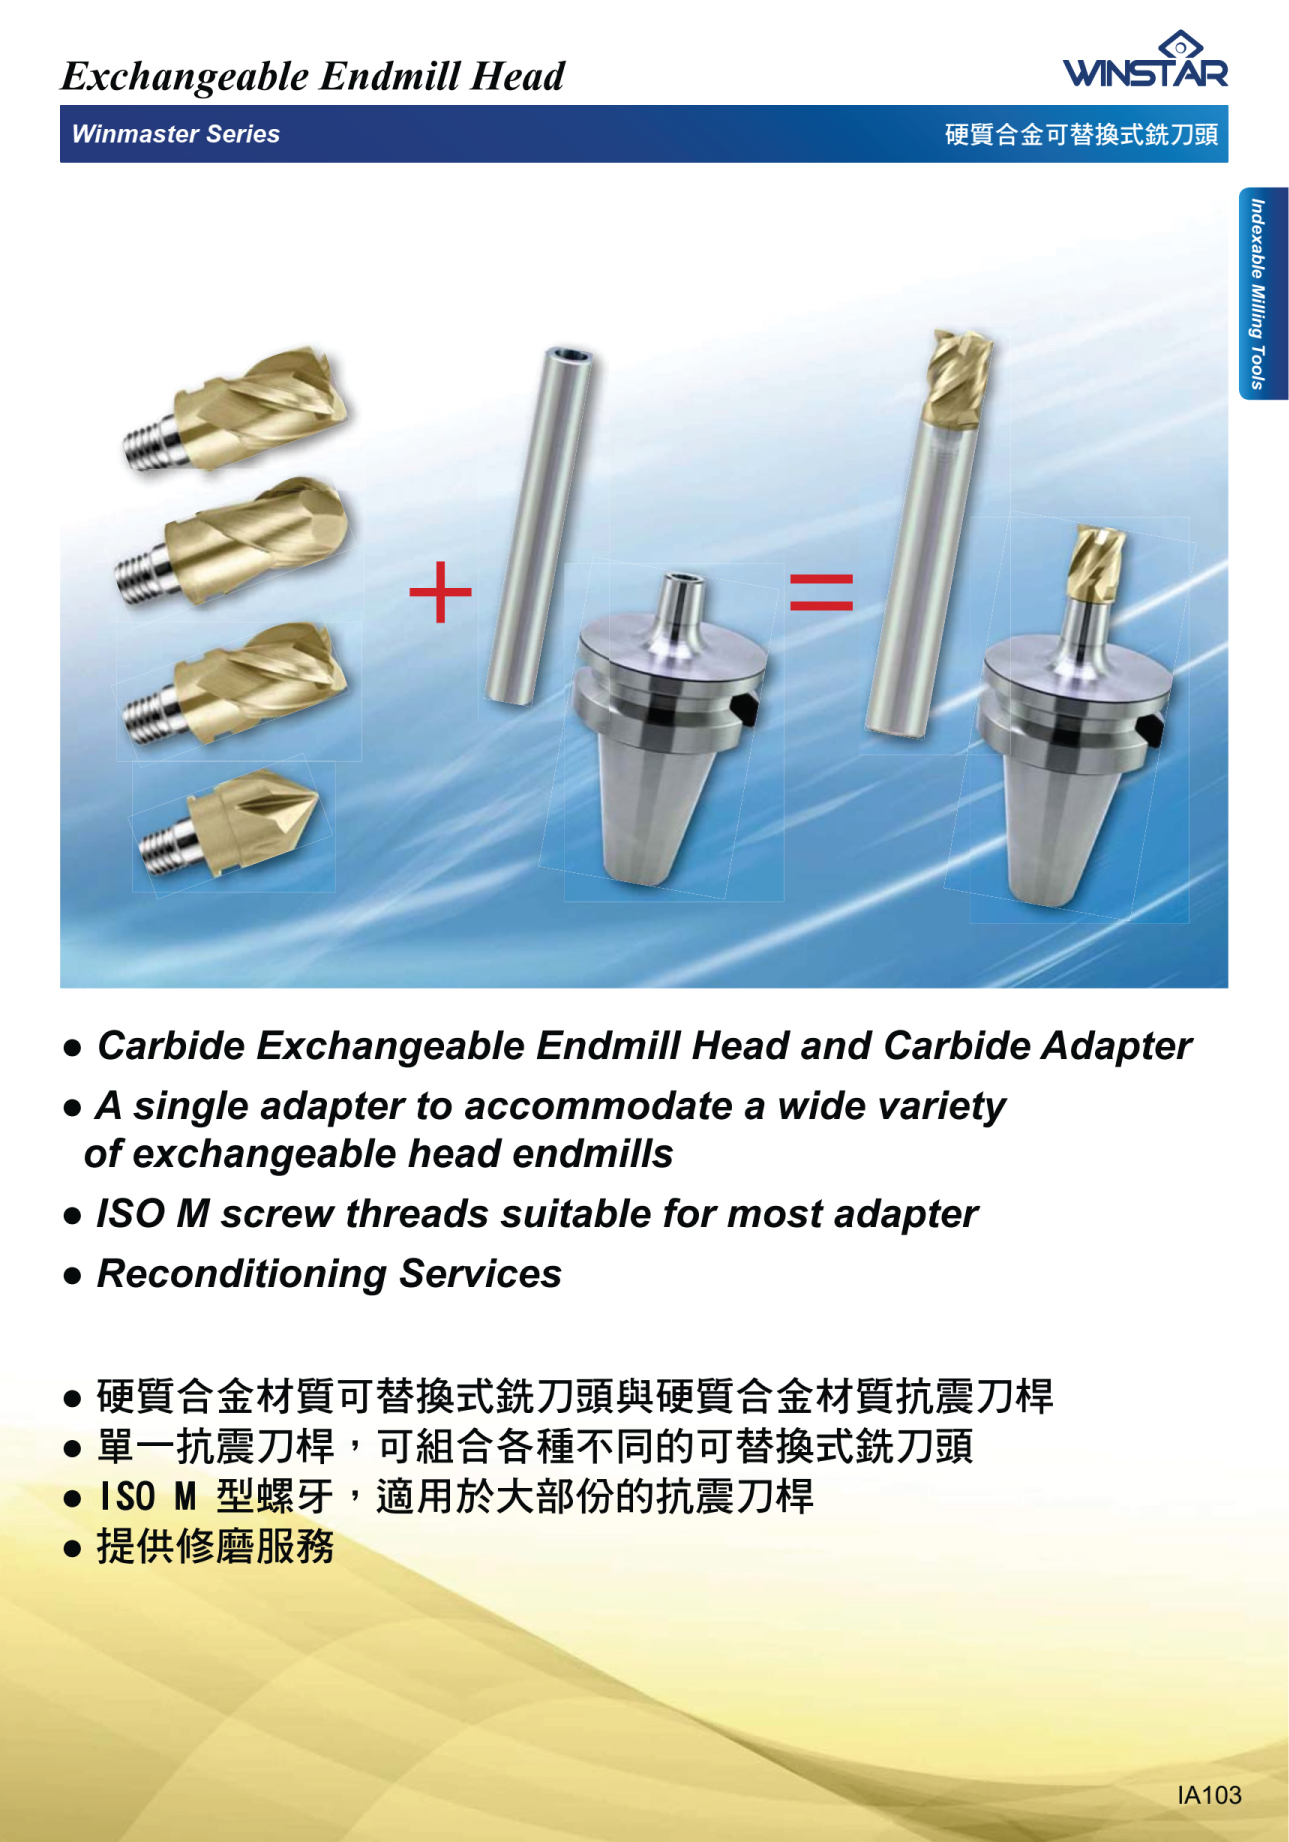 Đầu Dao Phay Cầu 2F Module Winstar EHBWH 1